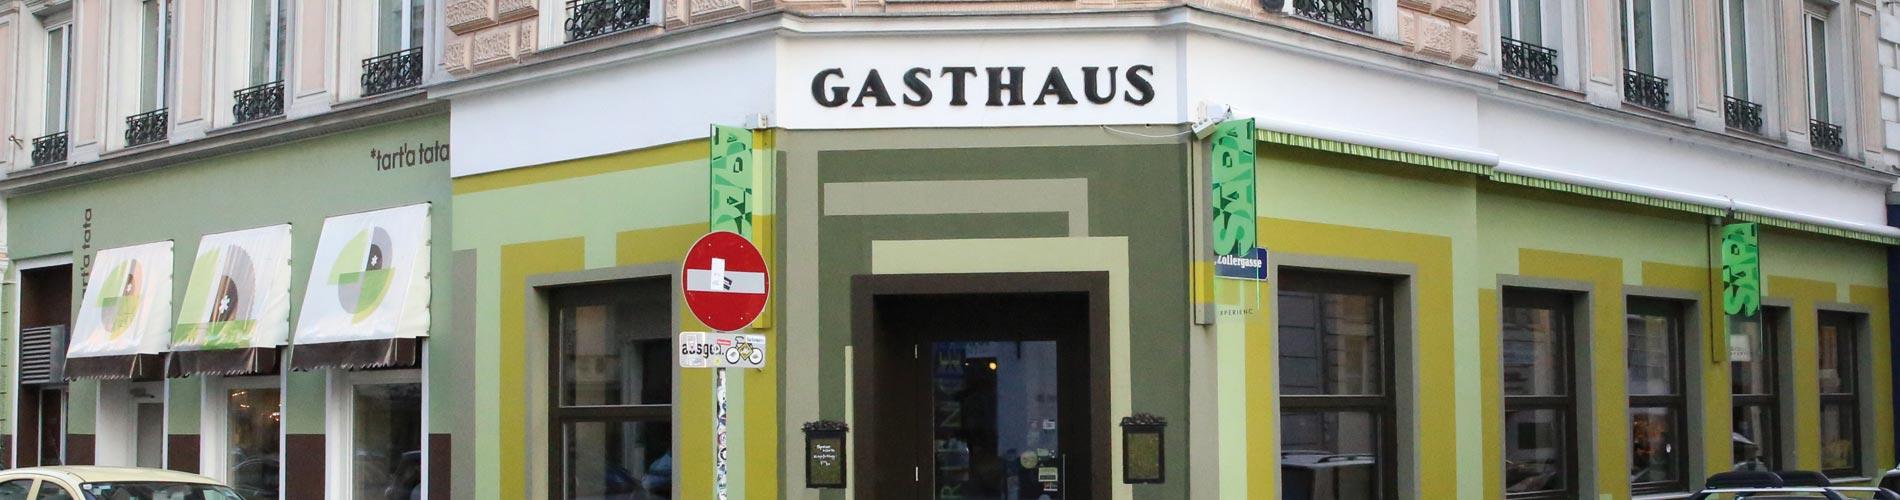 Gasthaus Sapa - 1070 Wien - Restaurant - Vegavita